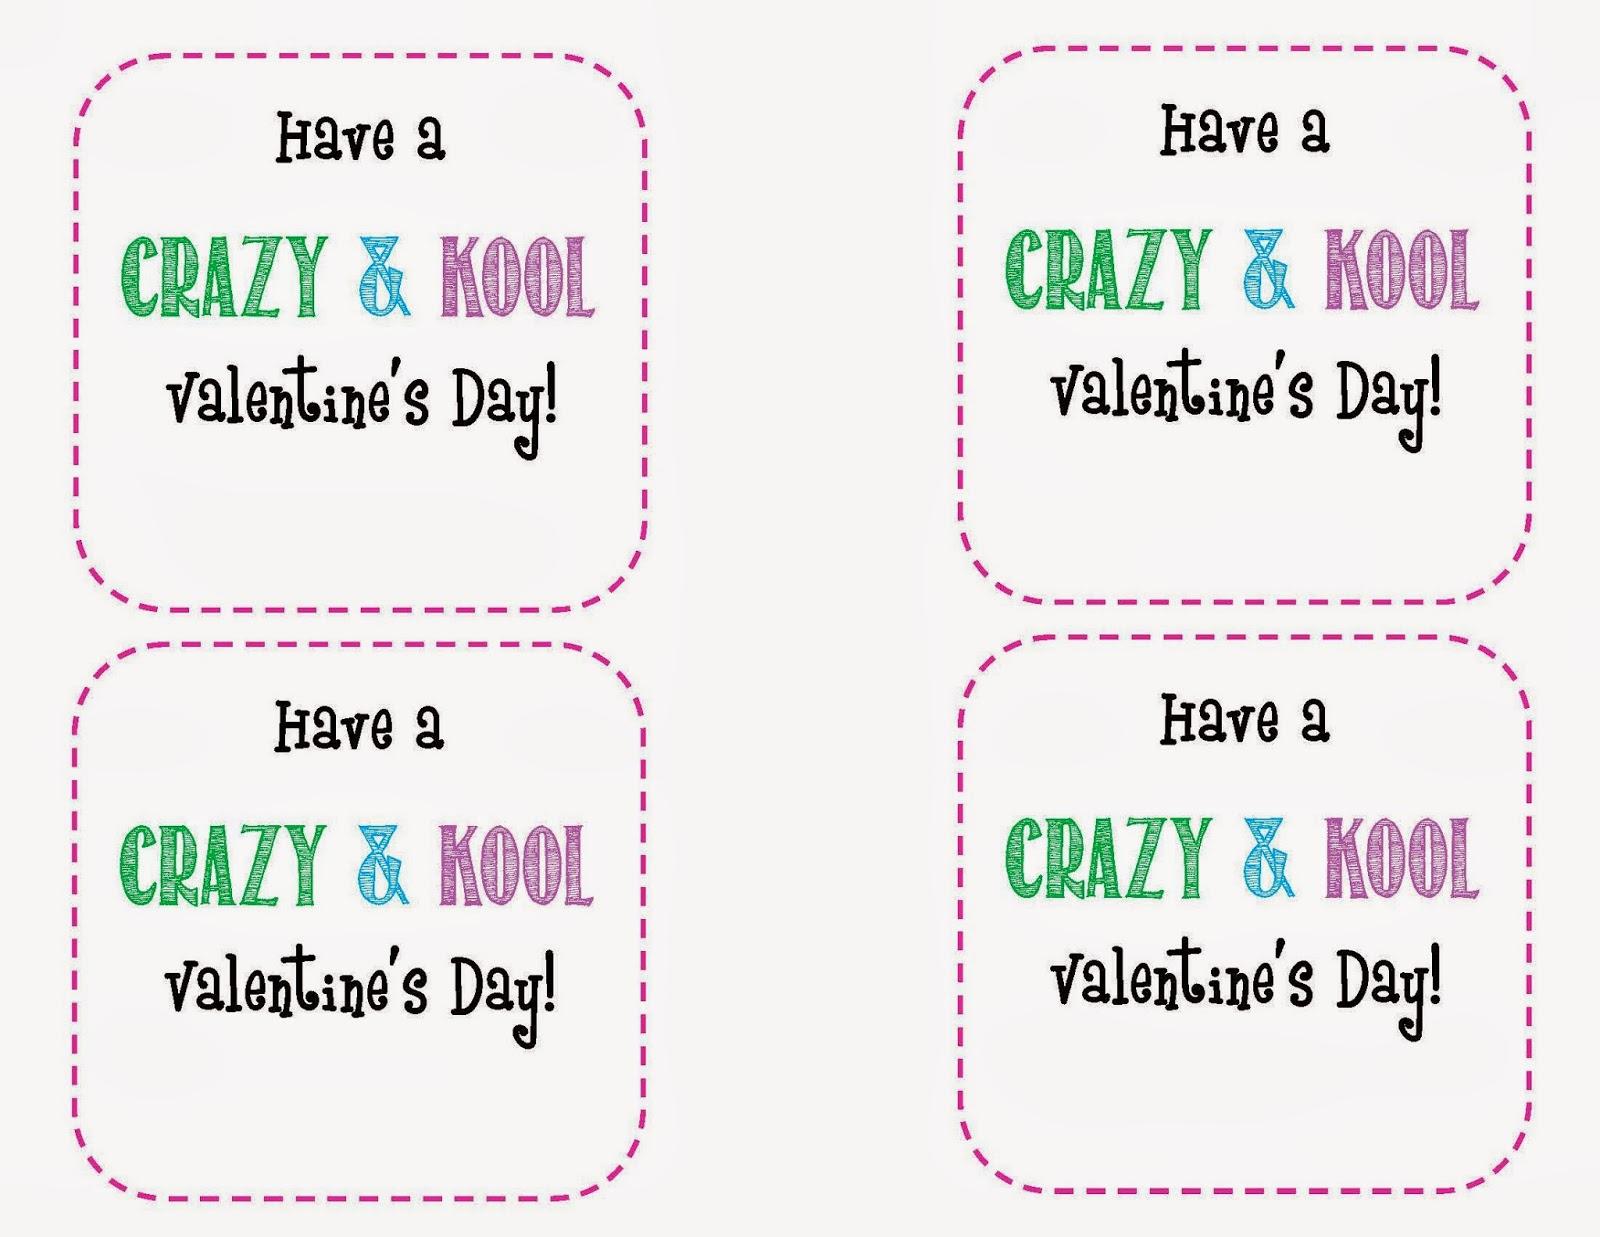 Crazy & Kool FREE Valentine Printable